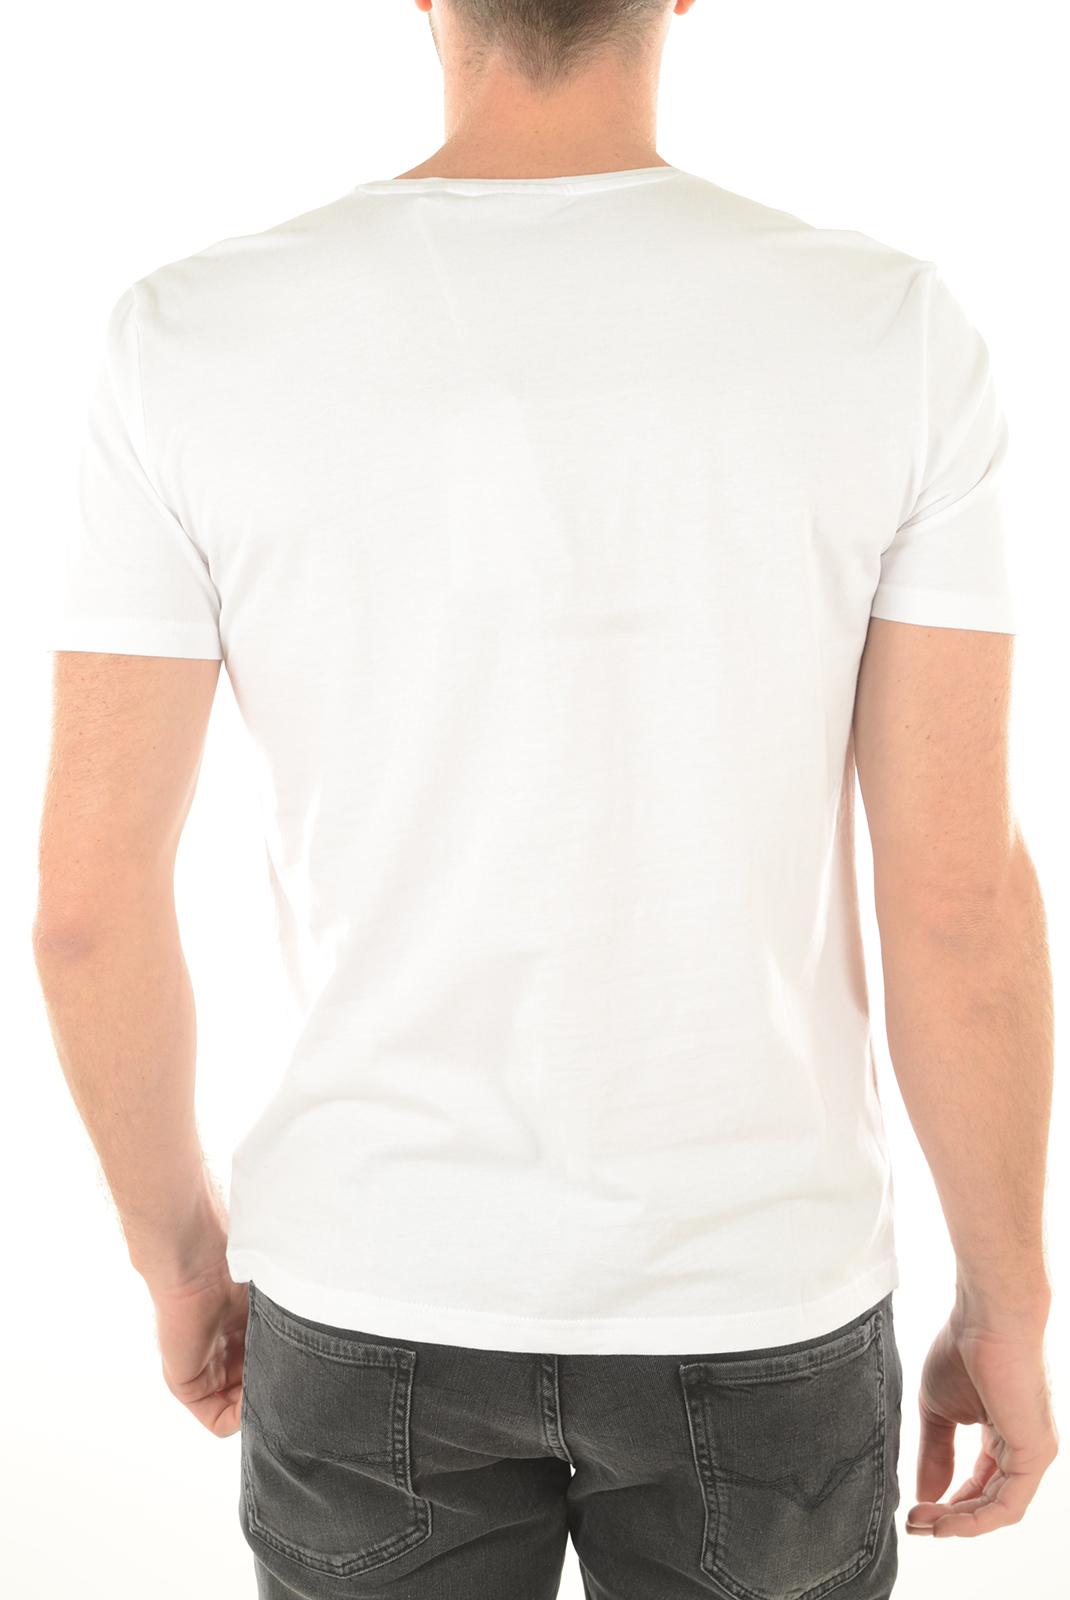 Tee-shirts  Kaporal CEBAZ WHITE